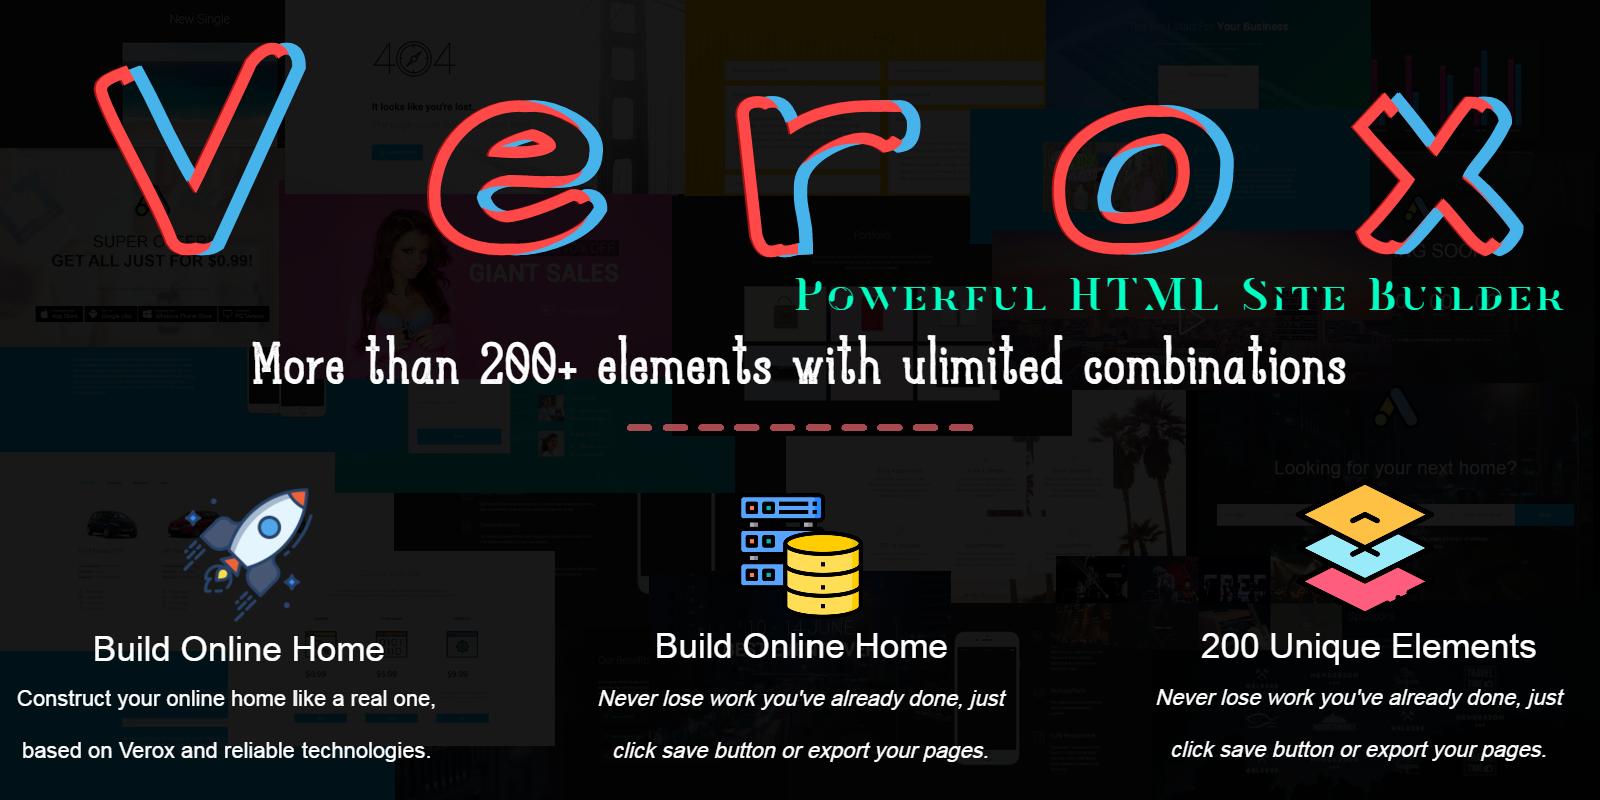 Verox - Powerful HTML Site Builder